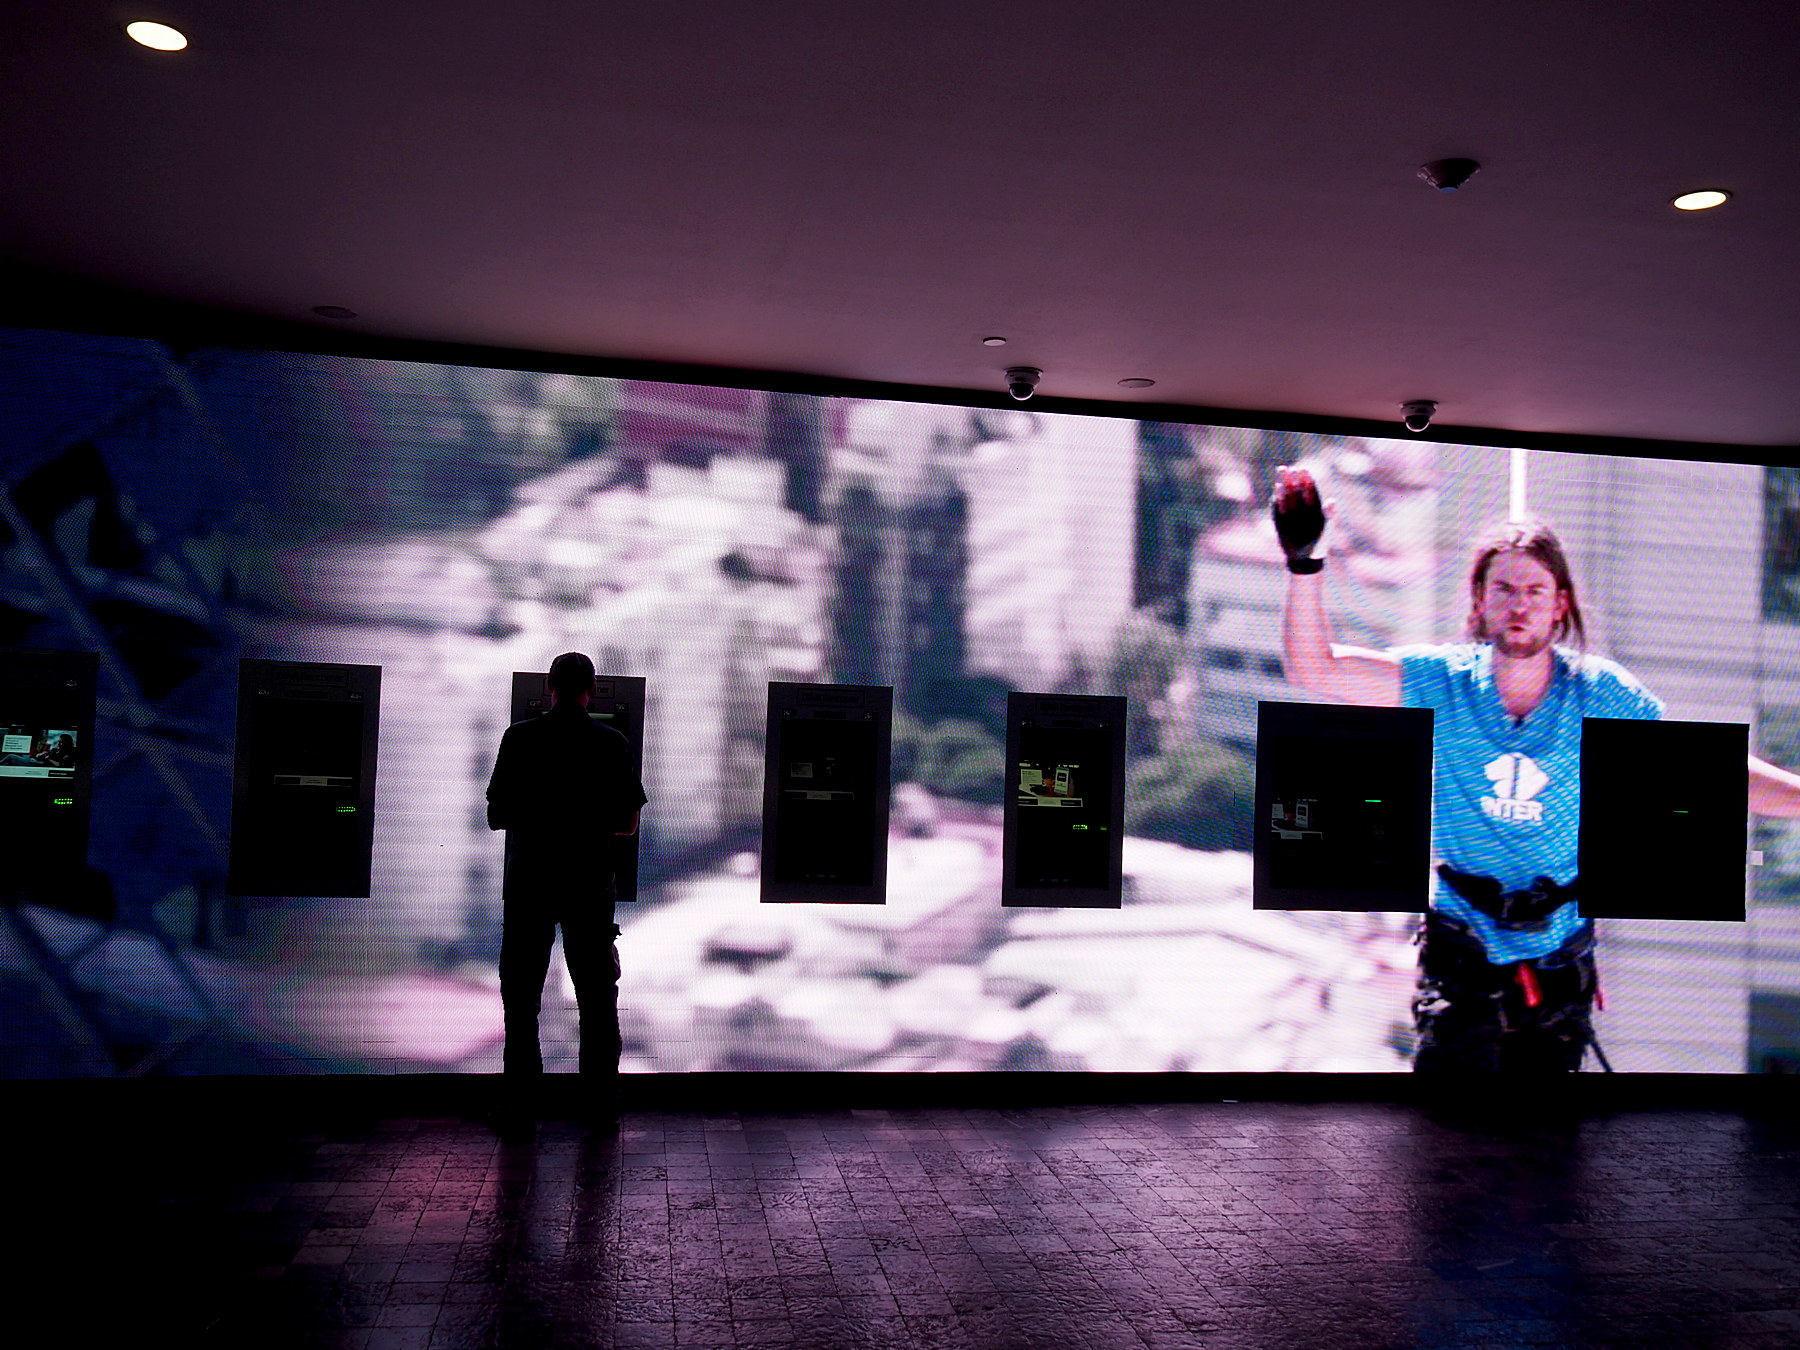 Hightech-Videowand mit Geldautomaten